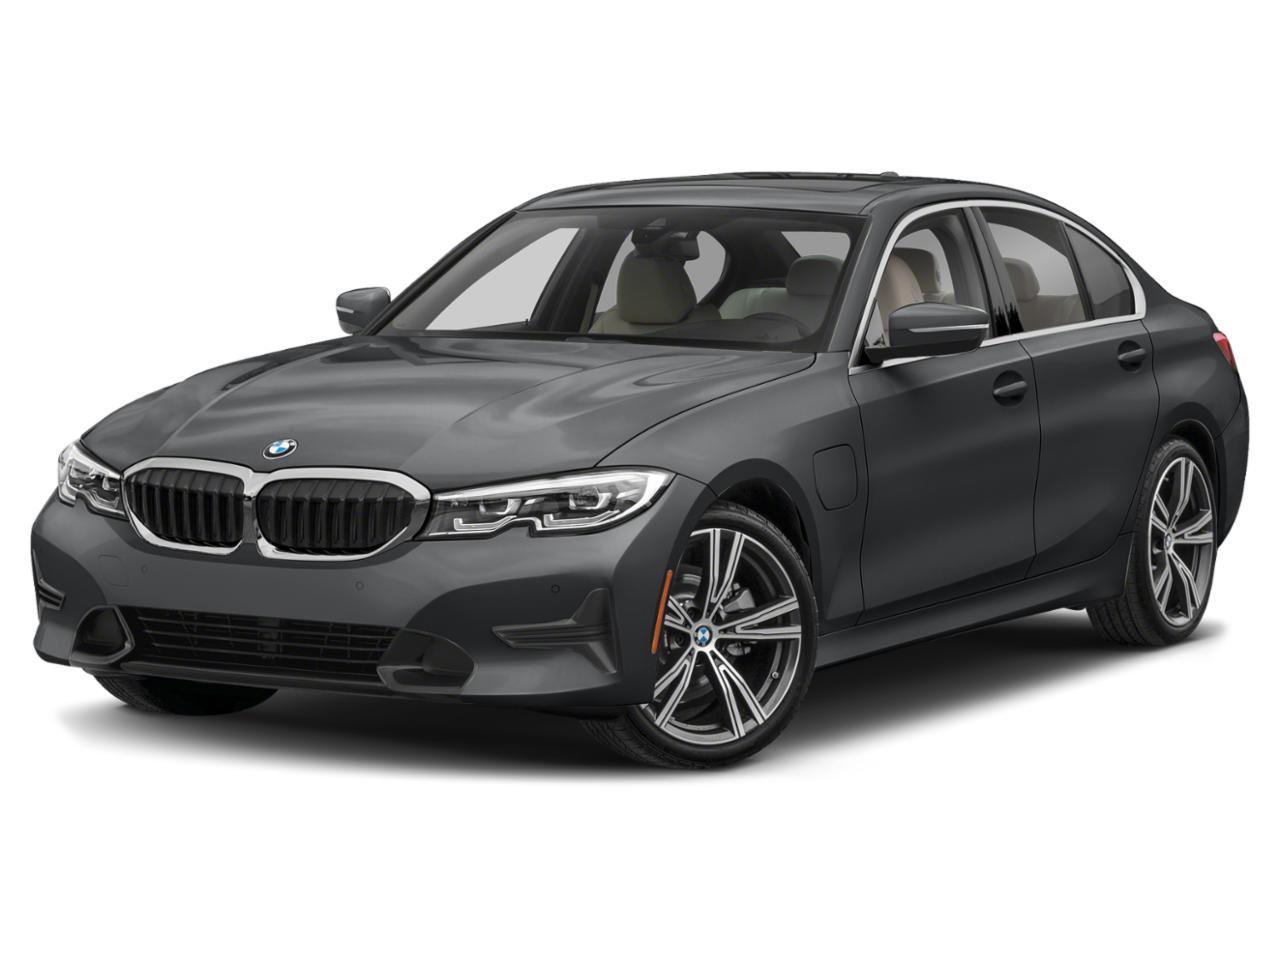 2021 BMW 330e xDrive Vehicle Photo in Grapevine, TX 76051